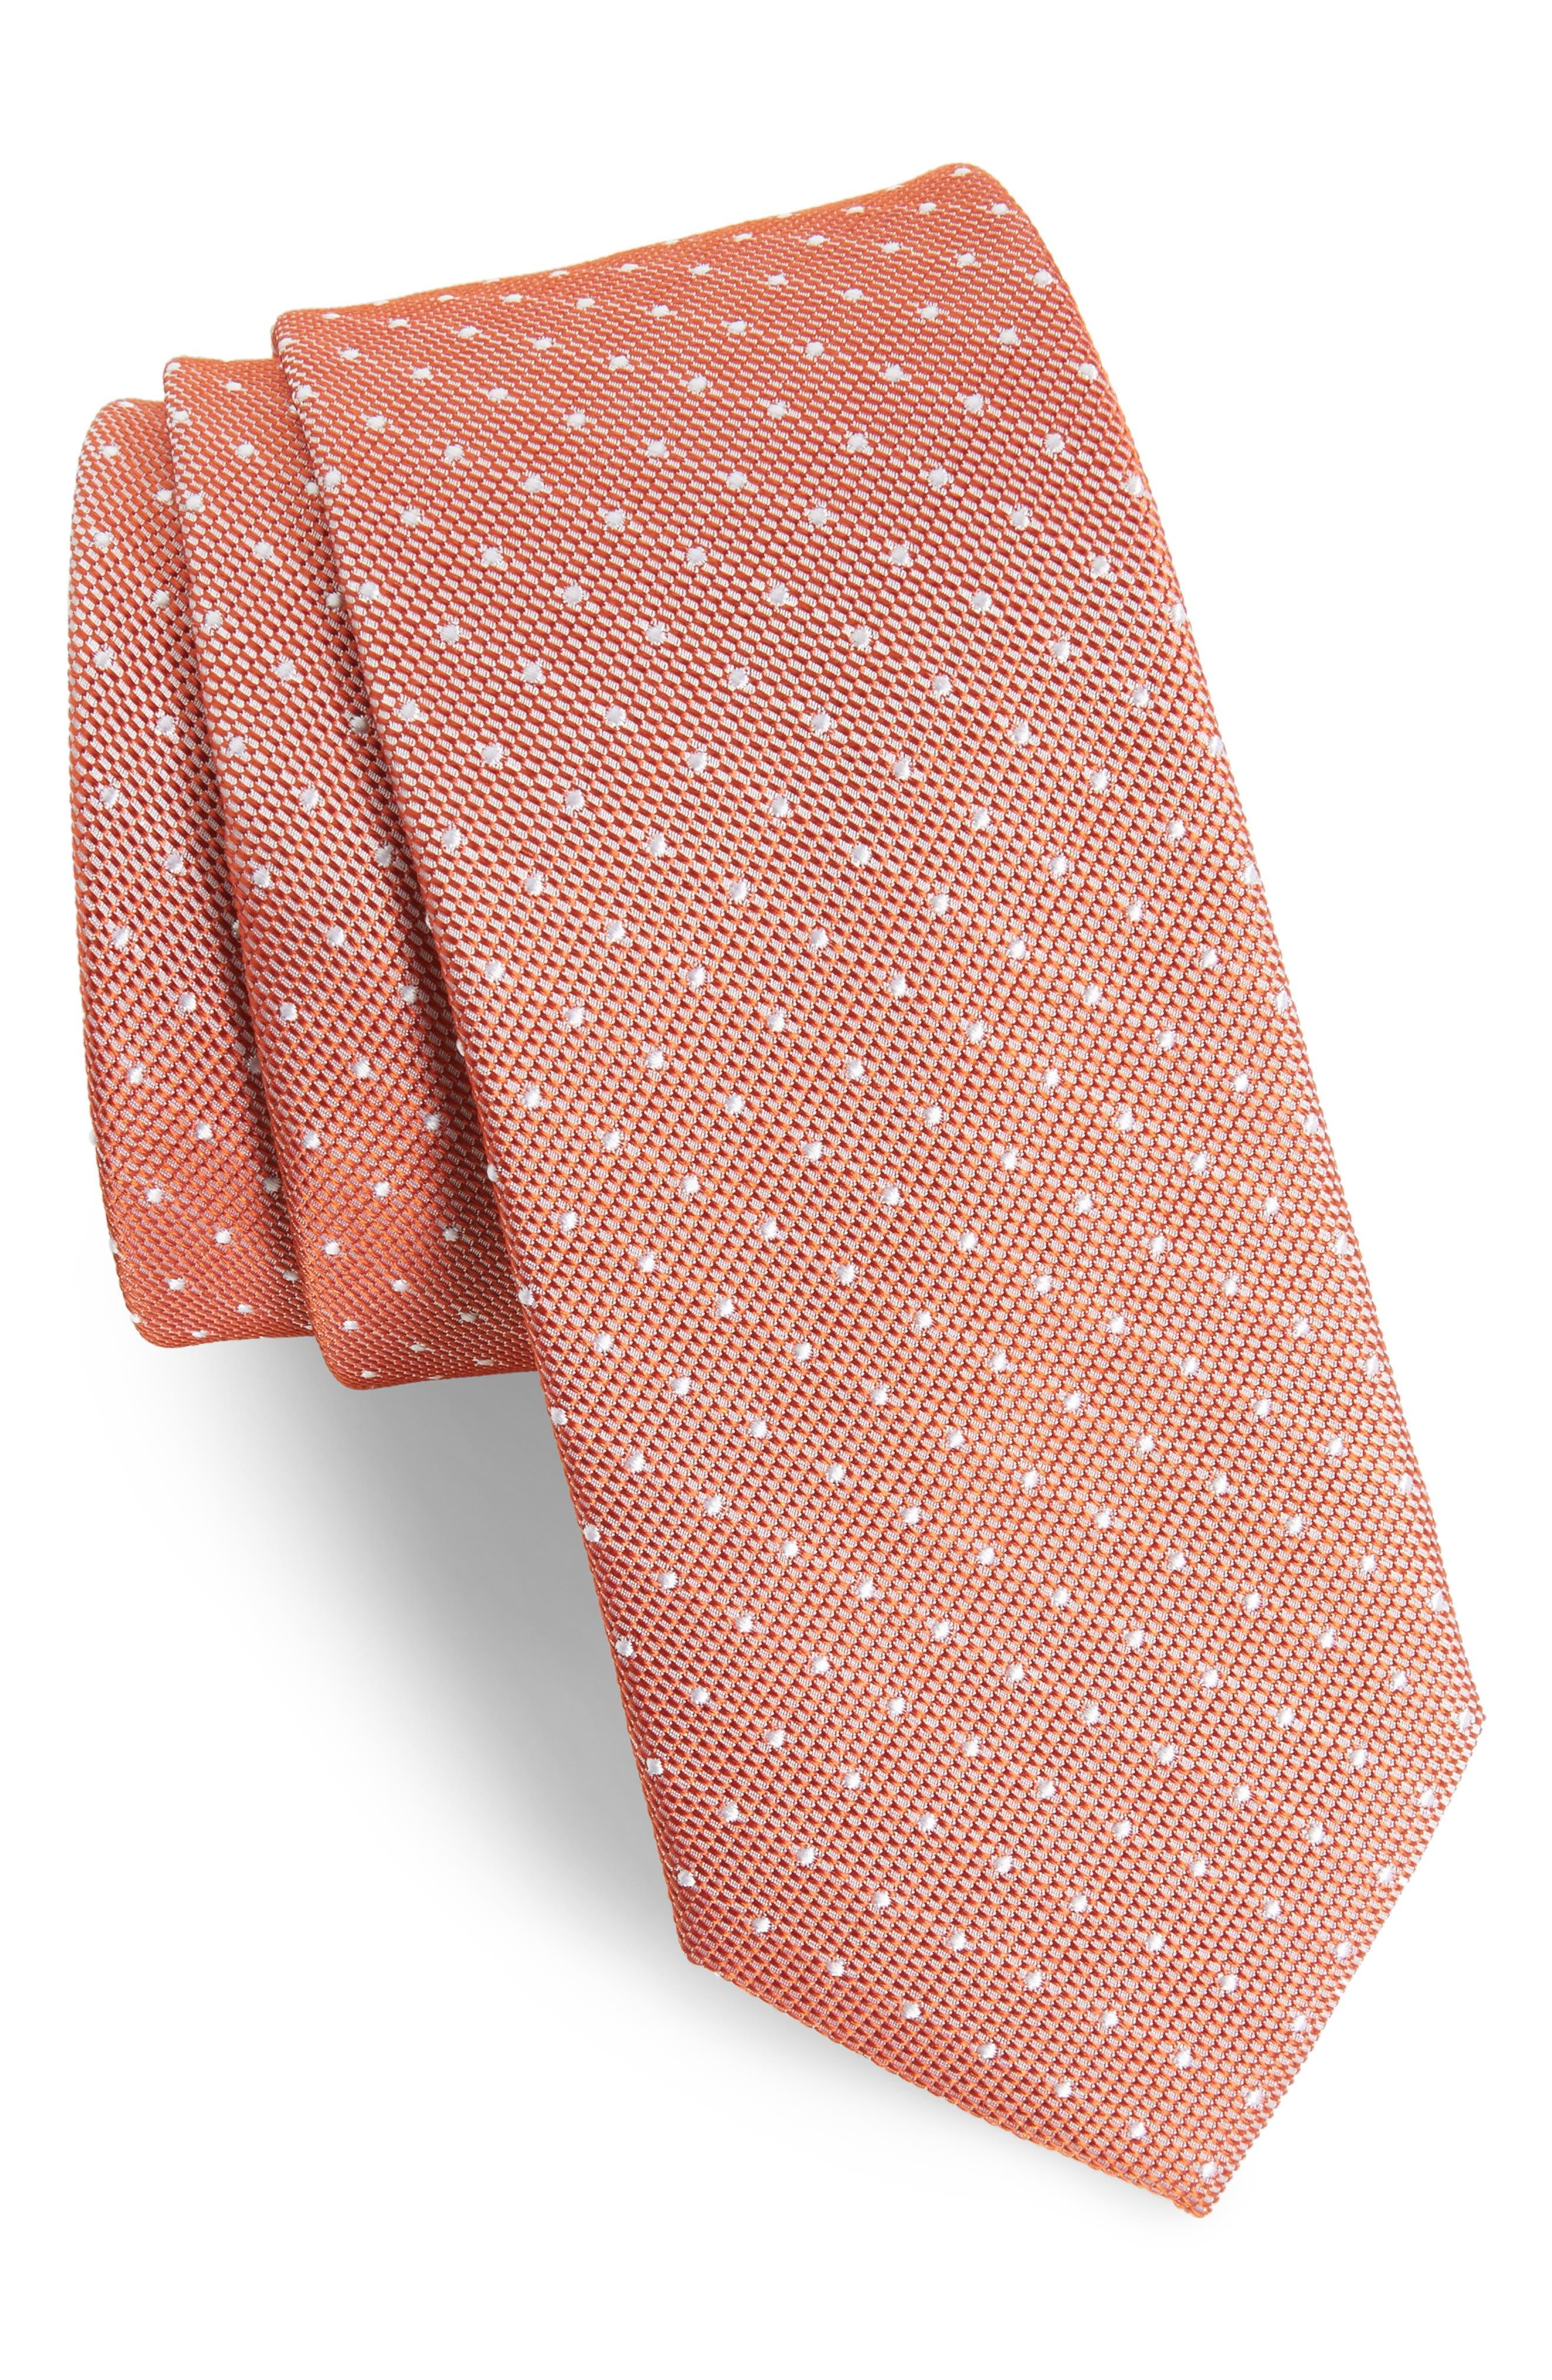 Alternate Image 1 Selected - 1901 Paseo Dot Silk Skinny Tie